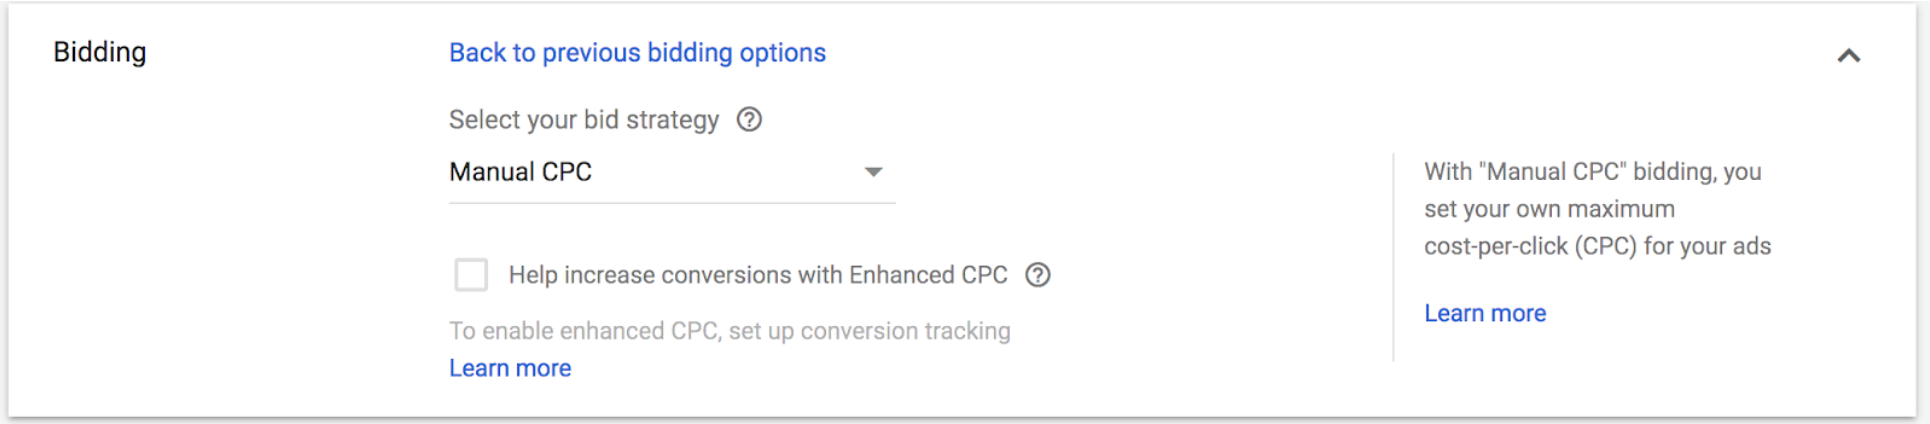 adwords cpc bidding options